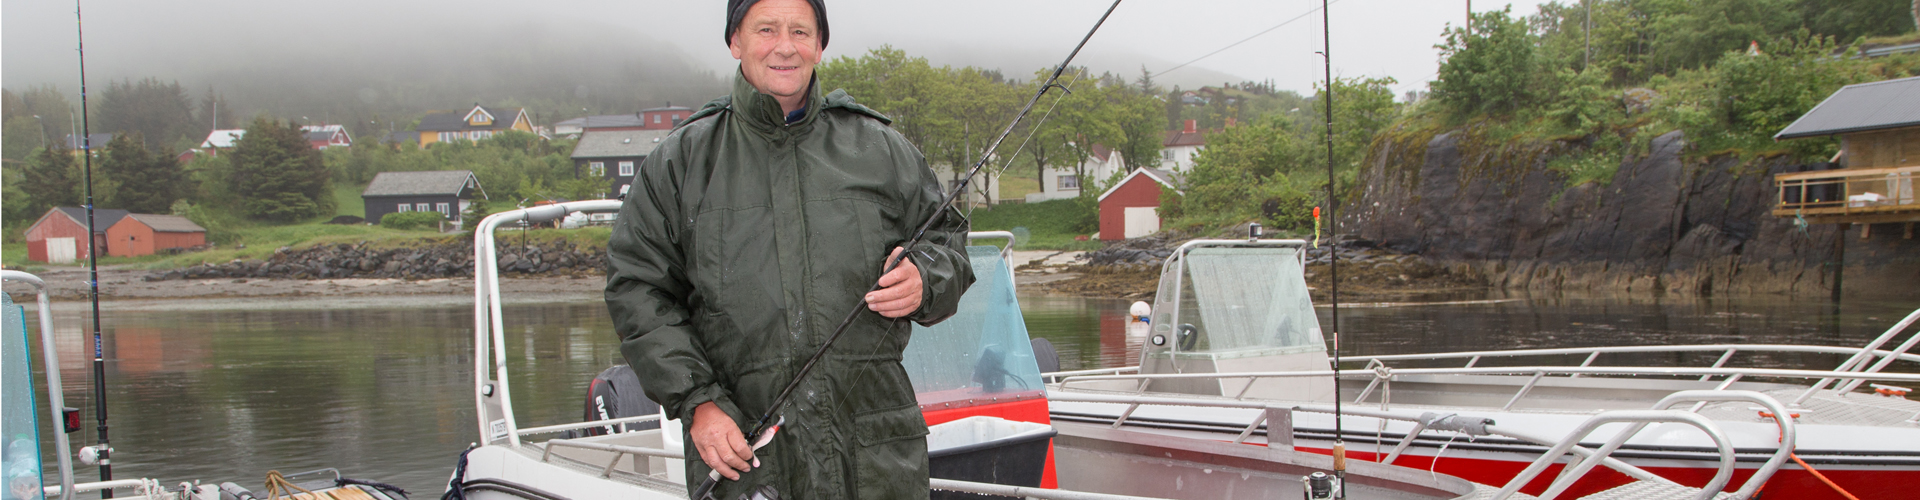 sjøfiske og båtutleie